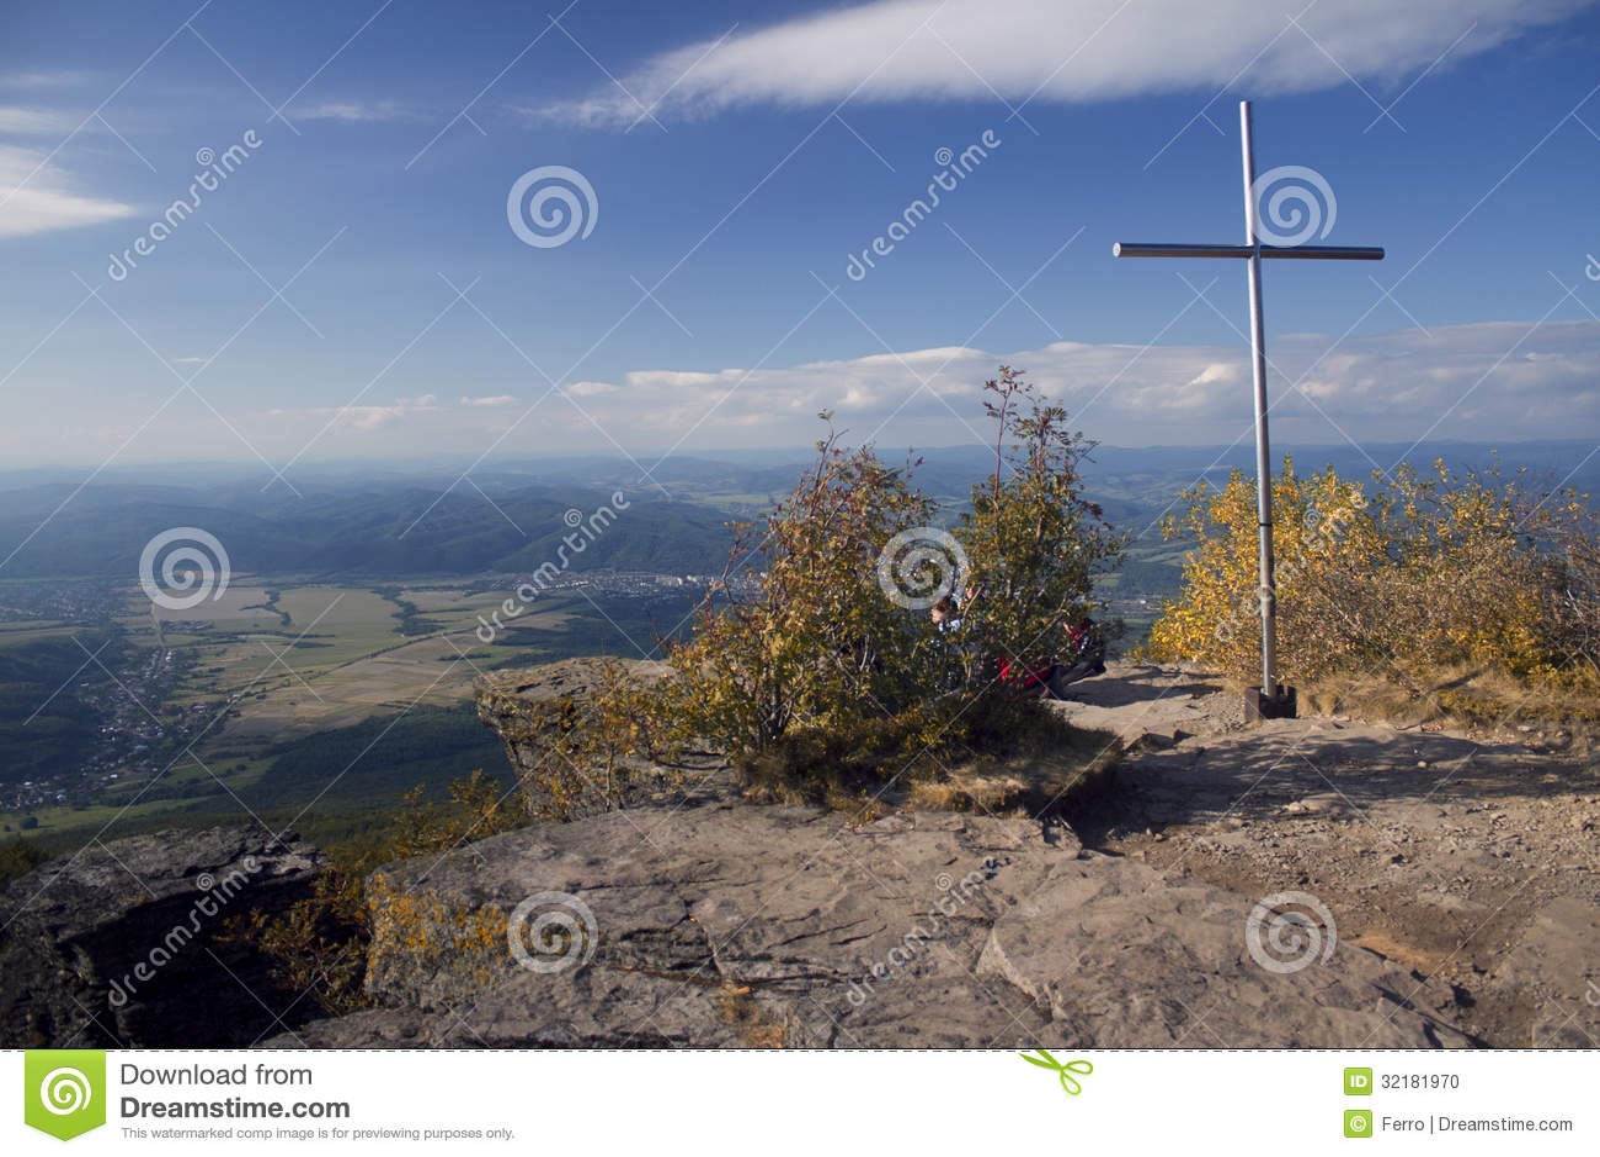 mount summit christian personals Mount summit christian church in mount summit, in -- get driving directions to 508 s walnut mount summit, in 47361 add reviews and photos for mount summit christian church.